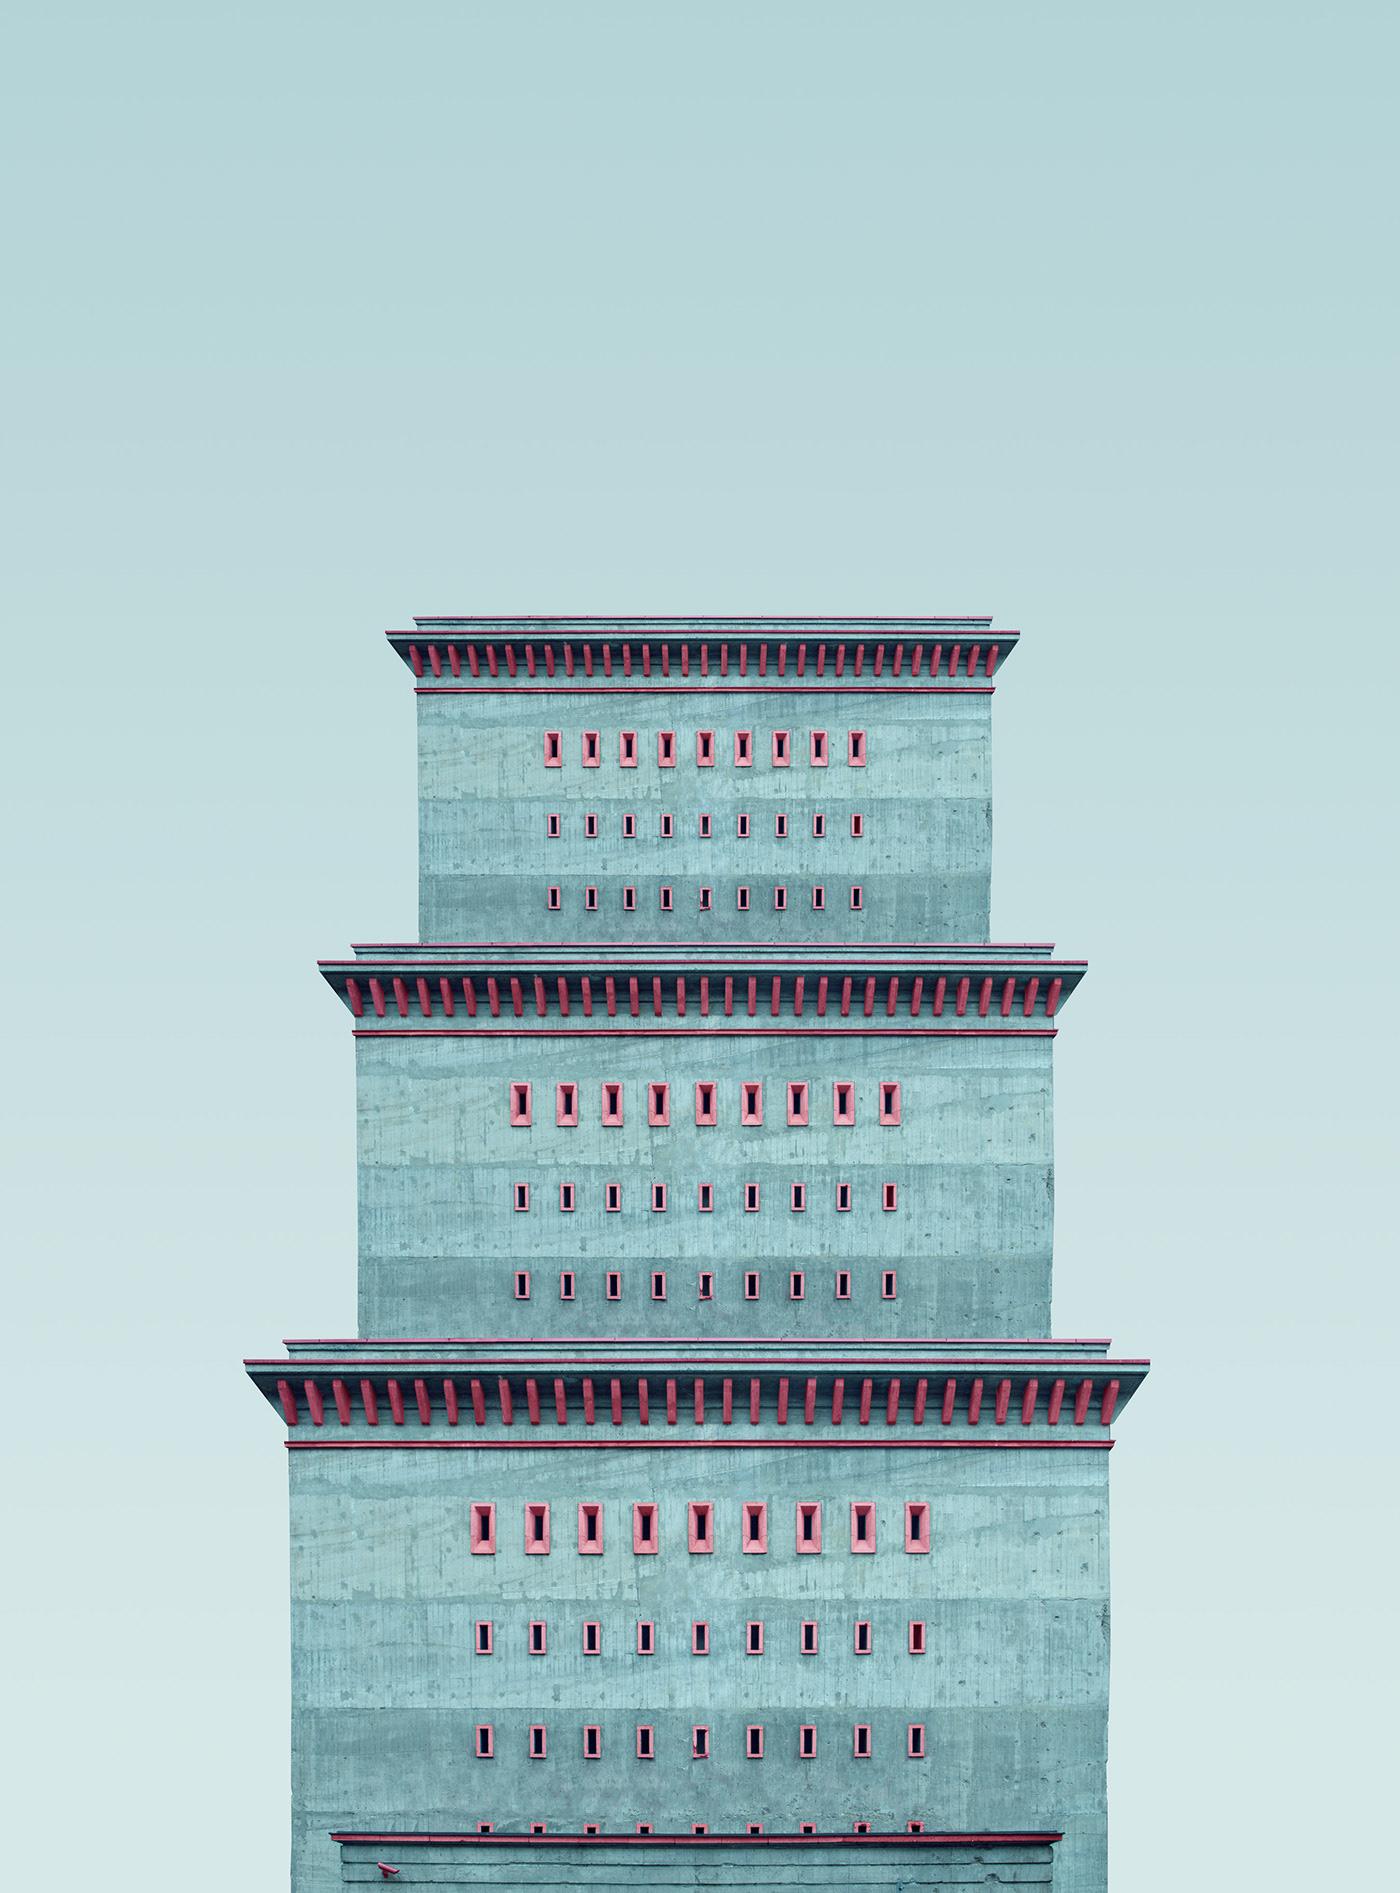 berlin minimal architecture modern surrealism Urban city geometry building pastel